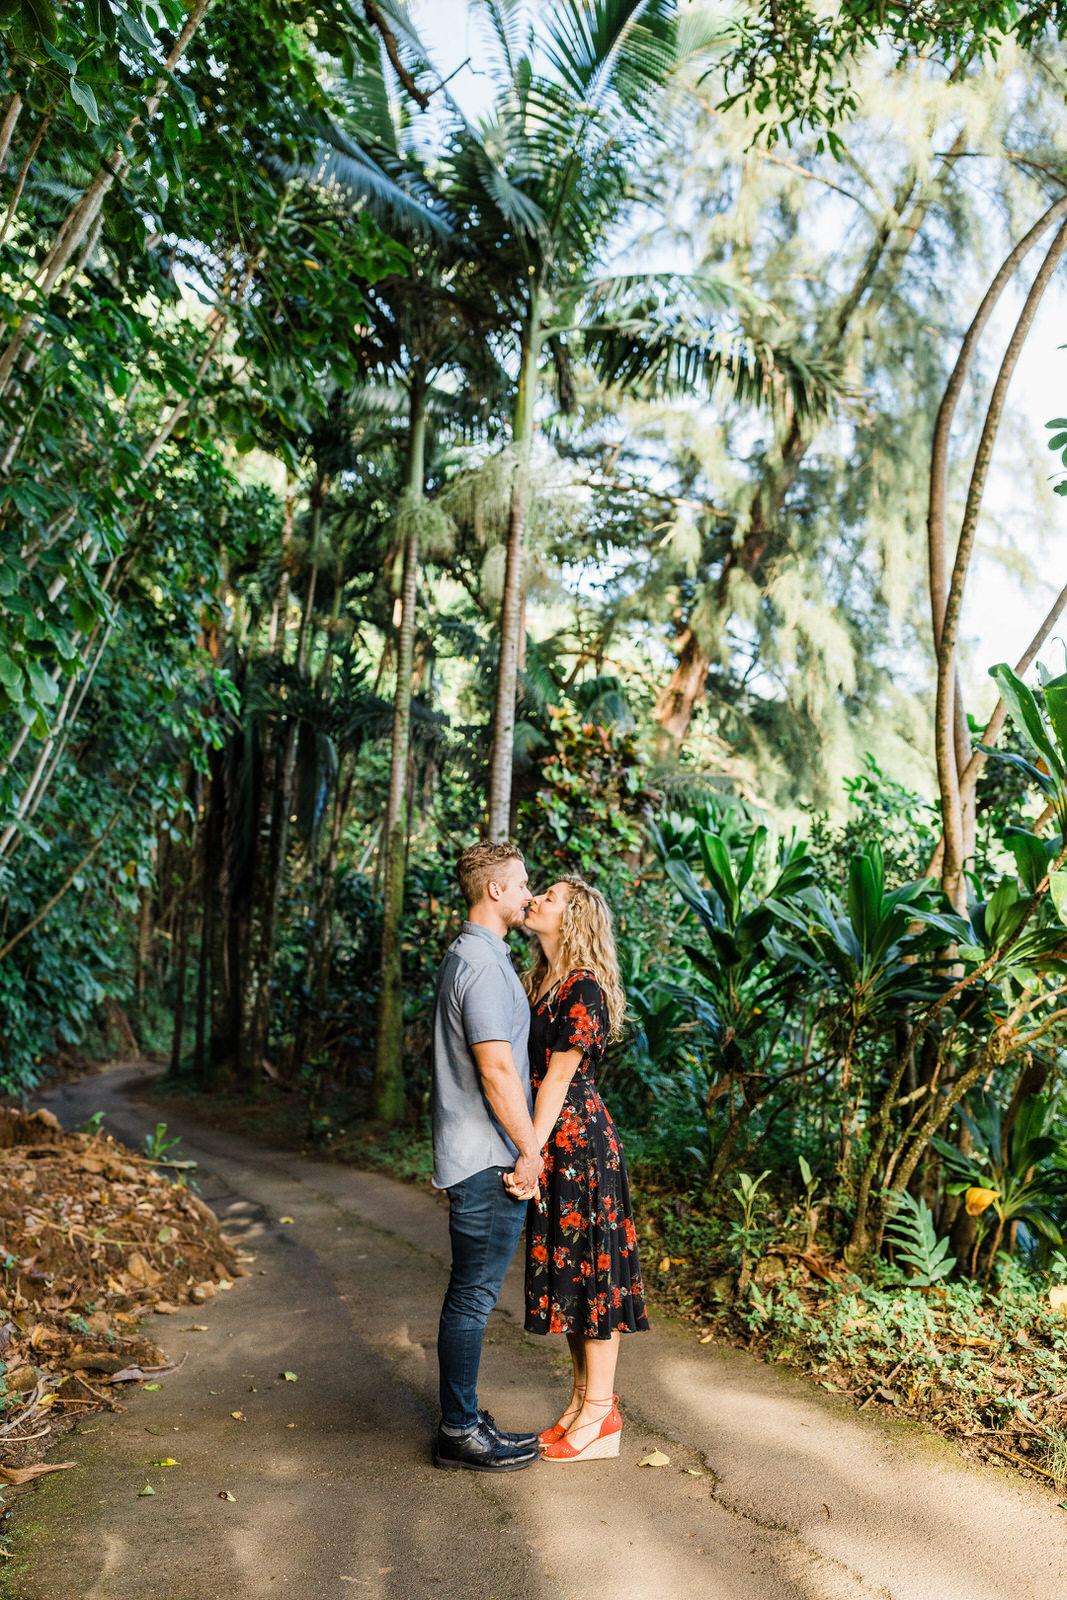 engagements-hilo-happy-couple-big-island-hawaii-16.jpg